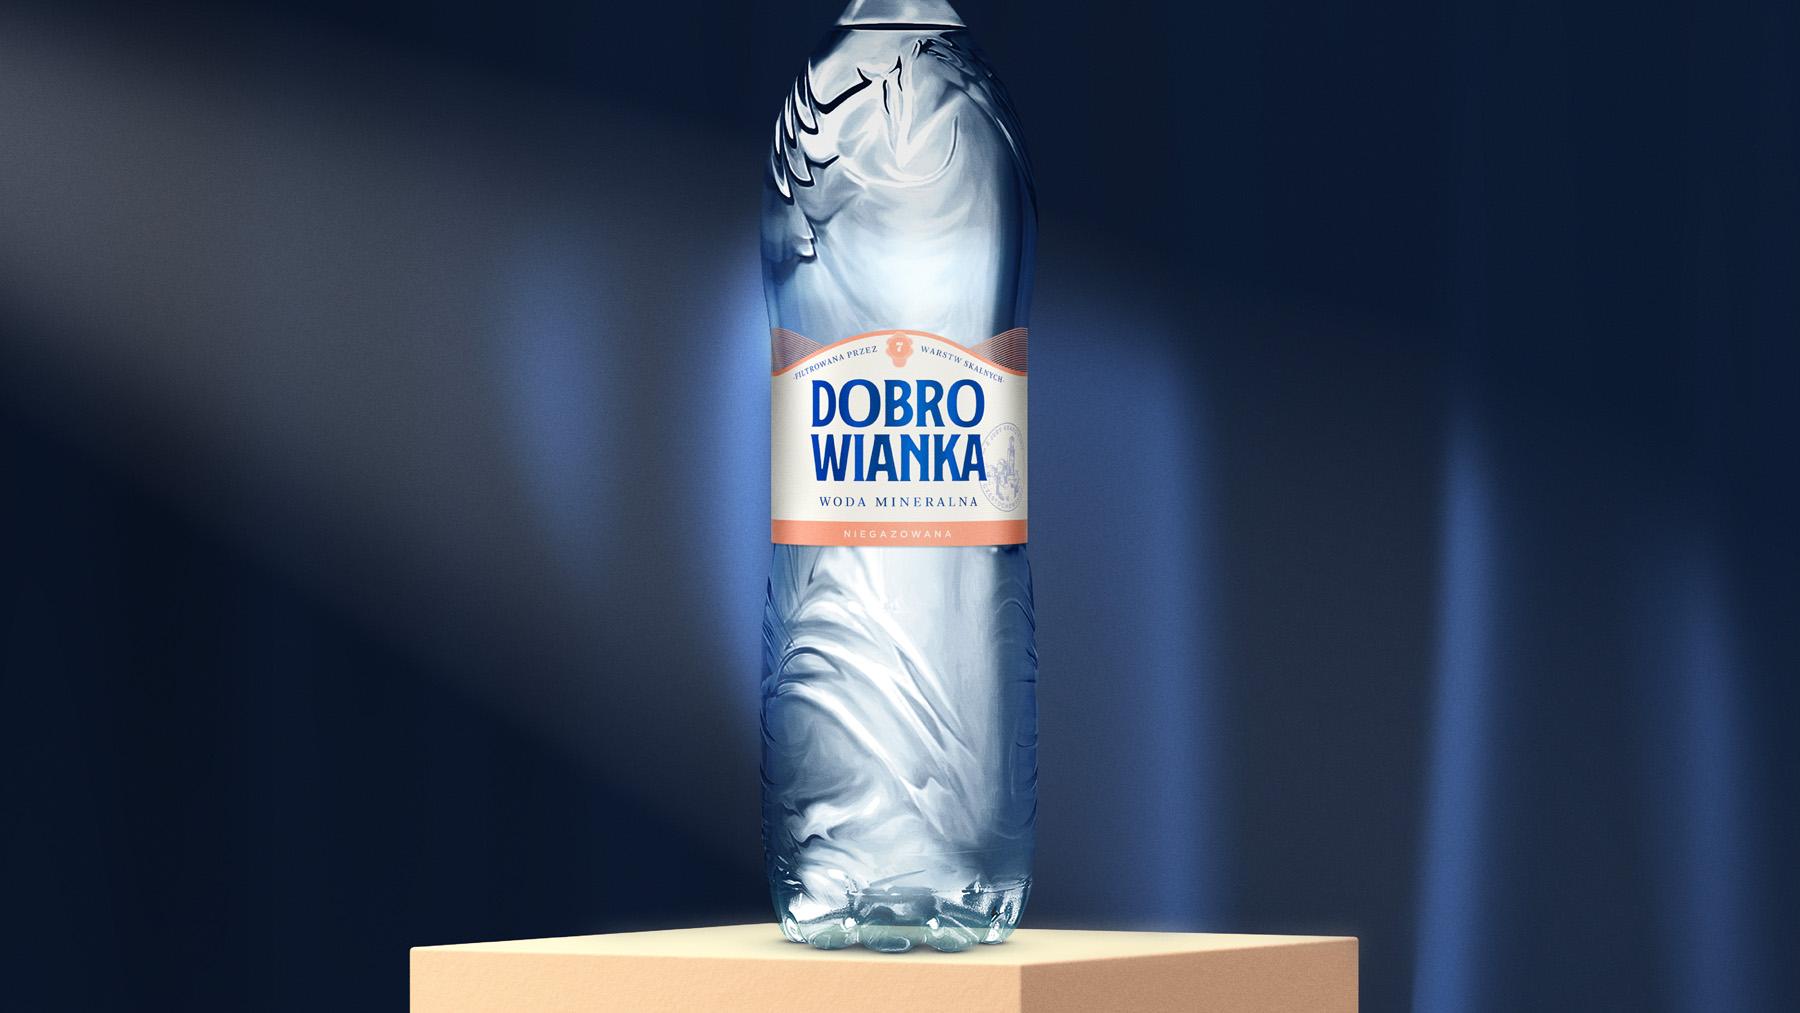 Everland Rejuvenates Danone's Polish Water Brand Dobrowianka